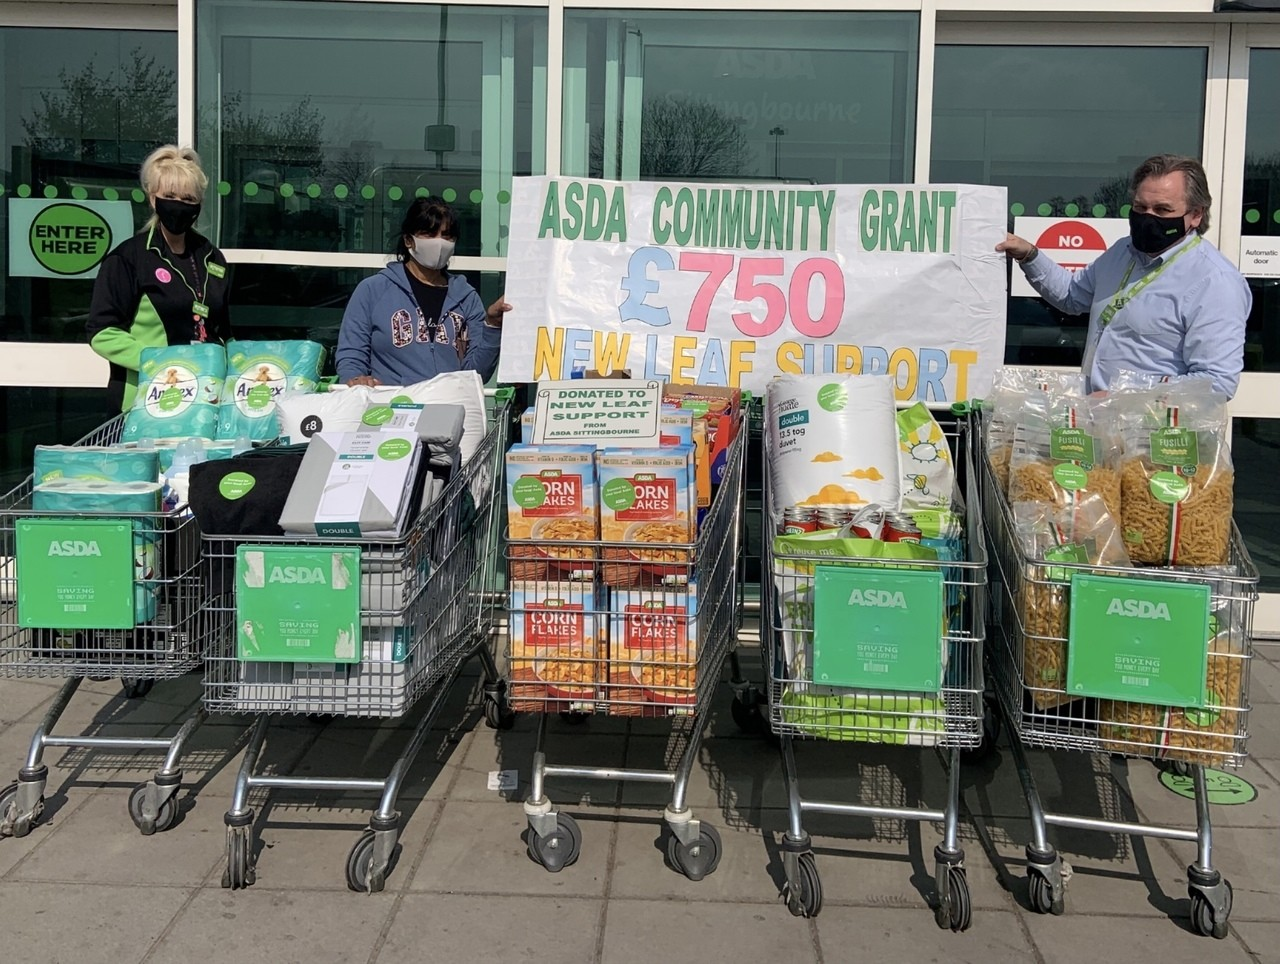 Grant for New Leaf Support   Asda Sittingbourne